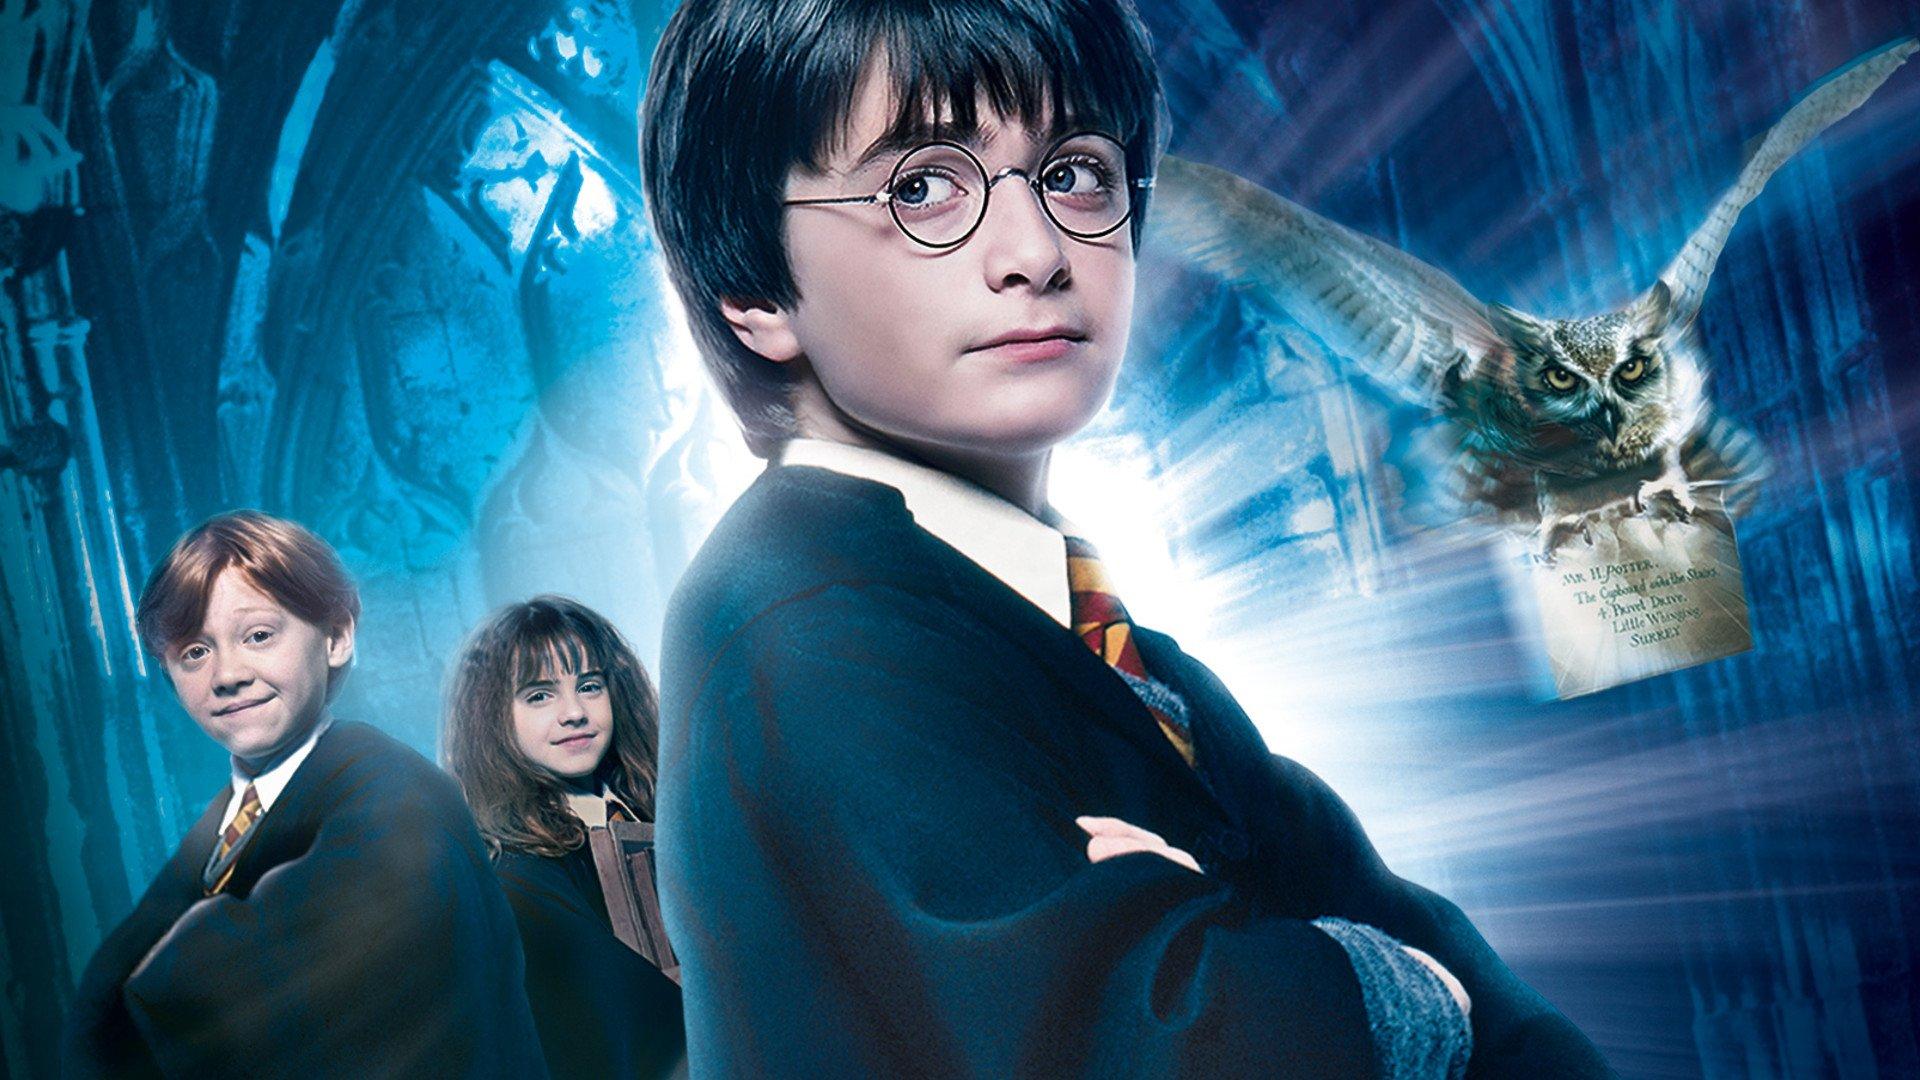 Best Wallpaper Harry Potter Blue - thumb-1920-676896  Trends_738334.jpg